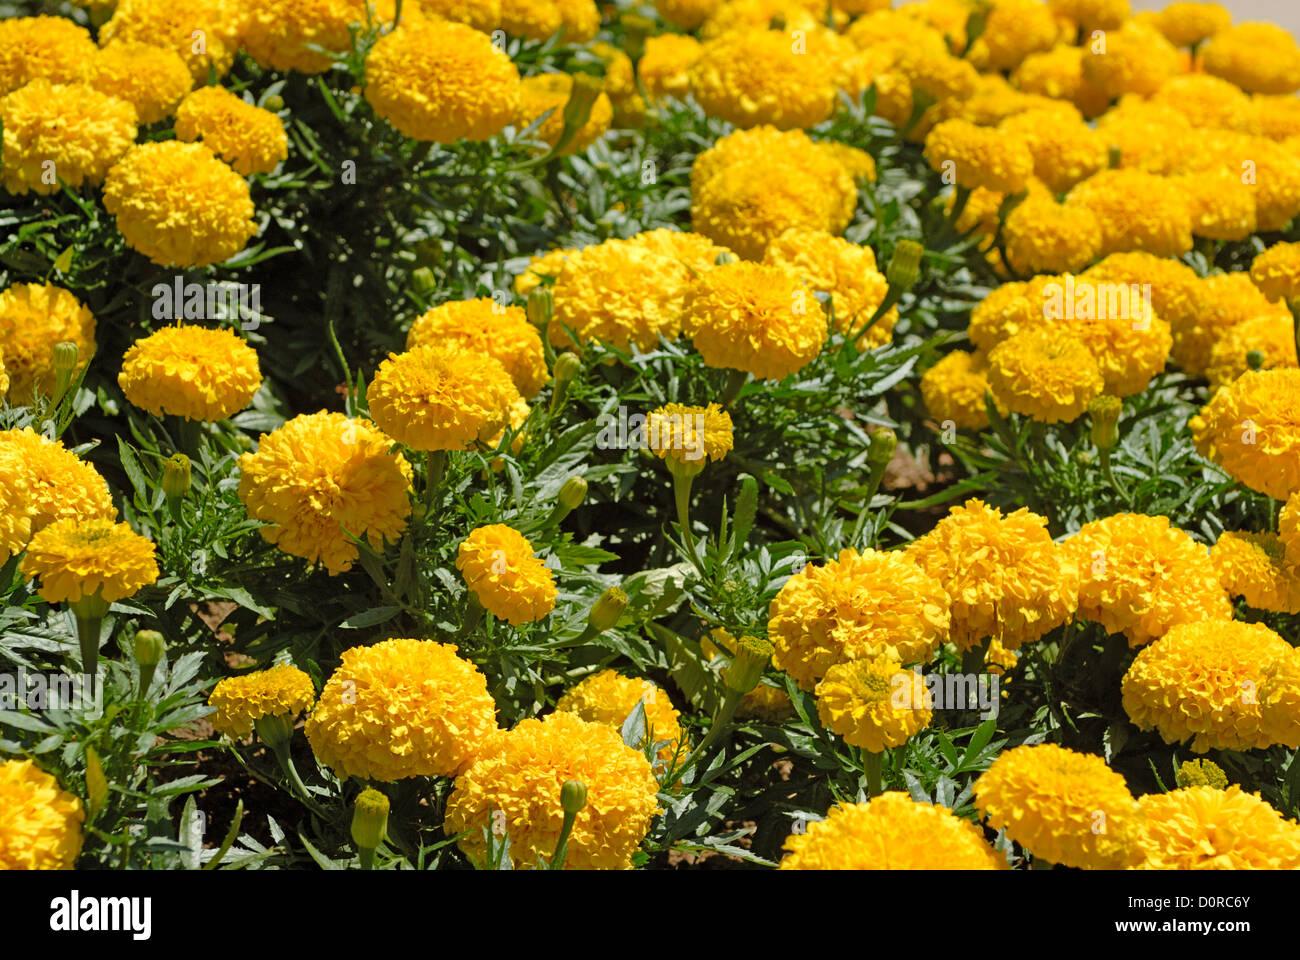 Field marigold flower stock photos field marigold flower stock marigold flower field stock image mightylinksfo